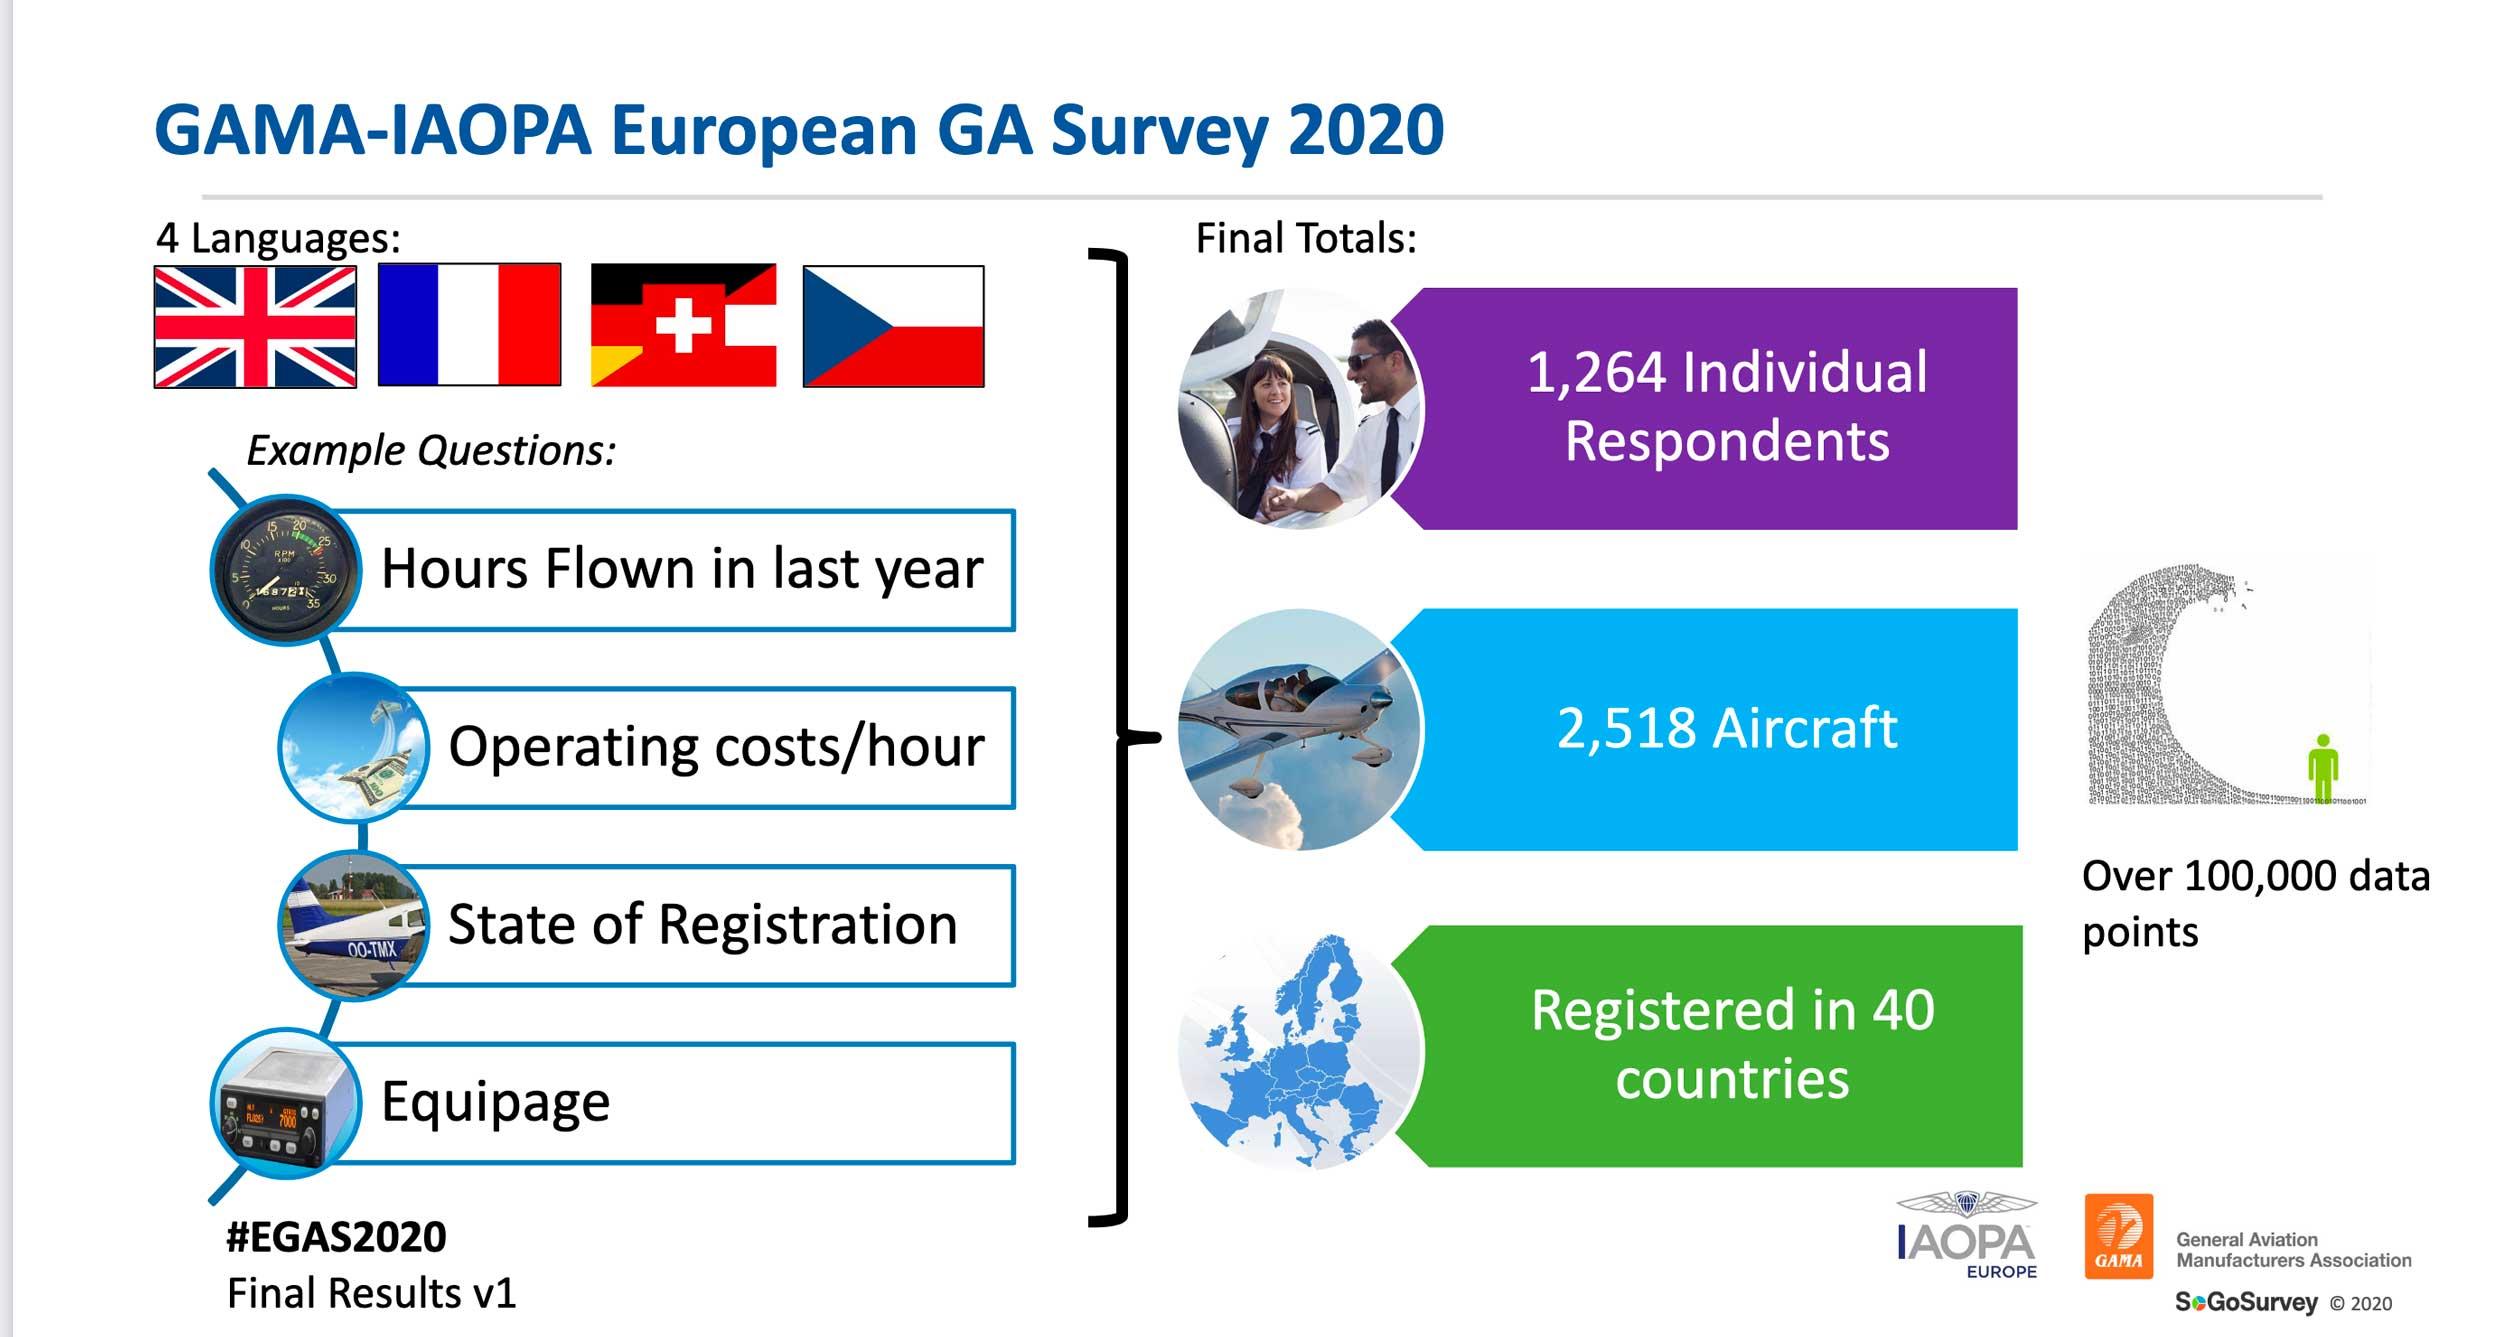 GA Survey 2020 results